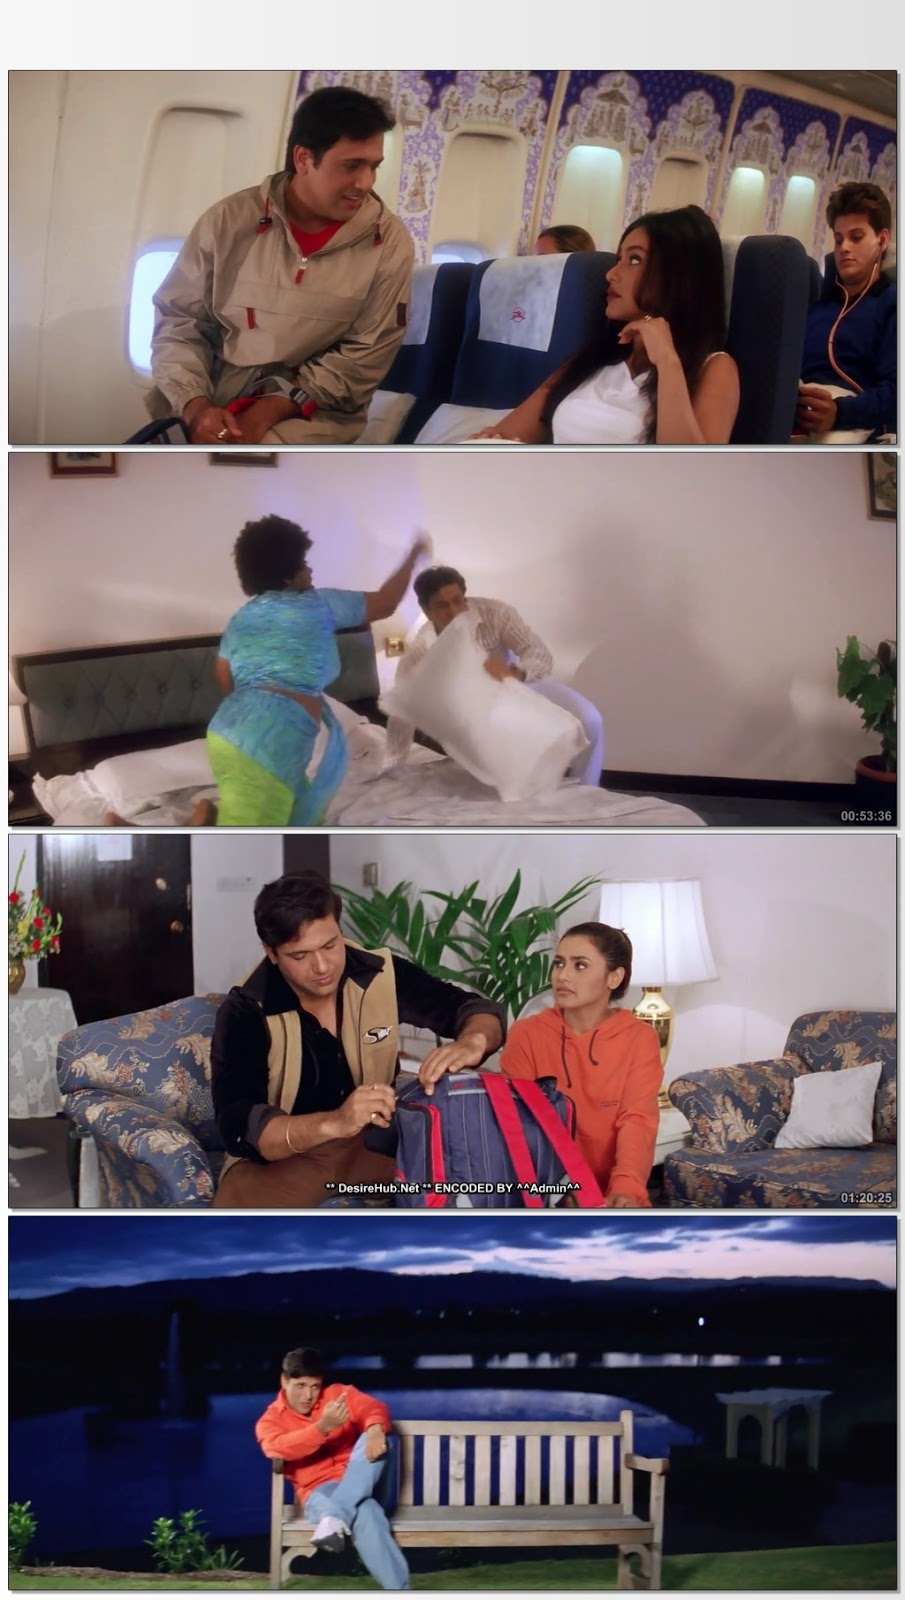 Hadh Kardi Aapne 2000 Hindi 480p WEB-DL 400MB ESub Desirehub